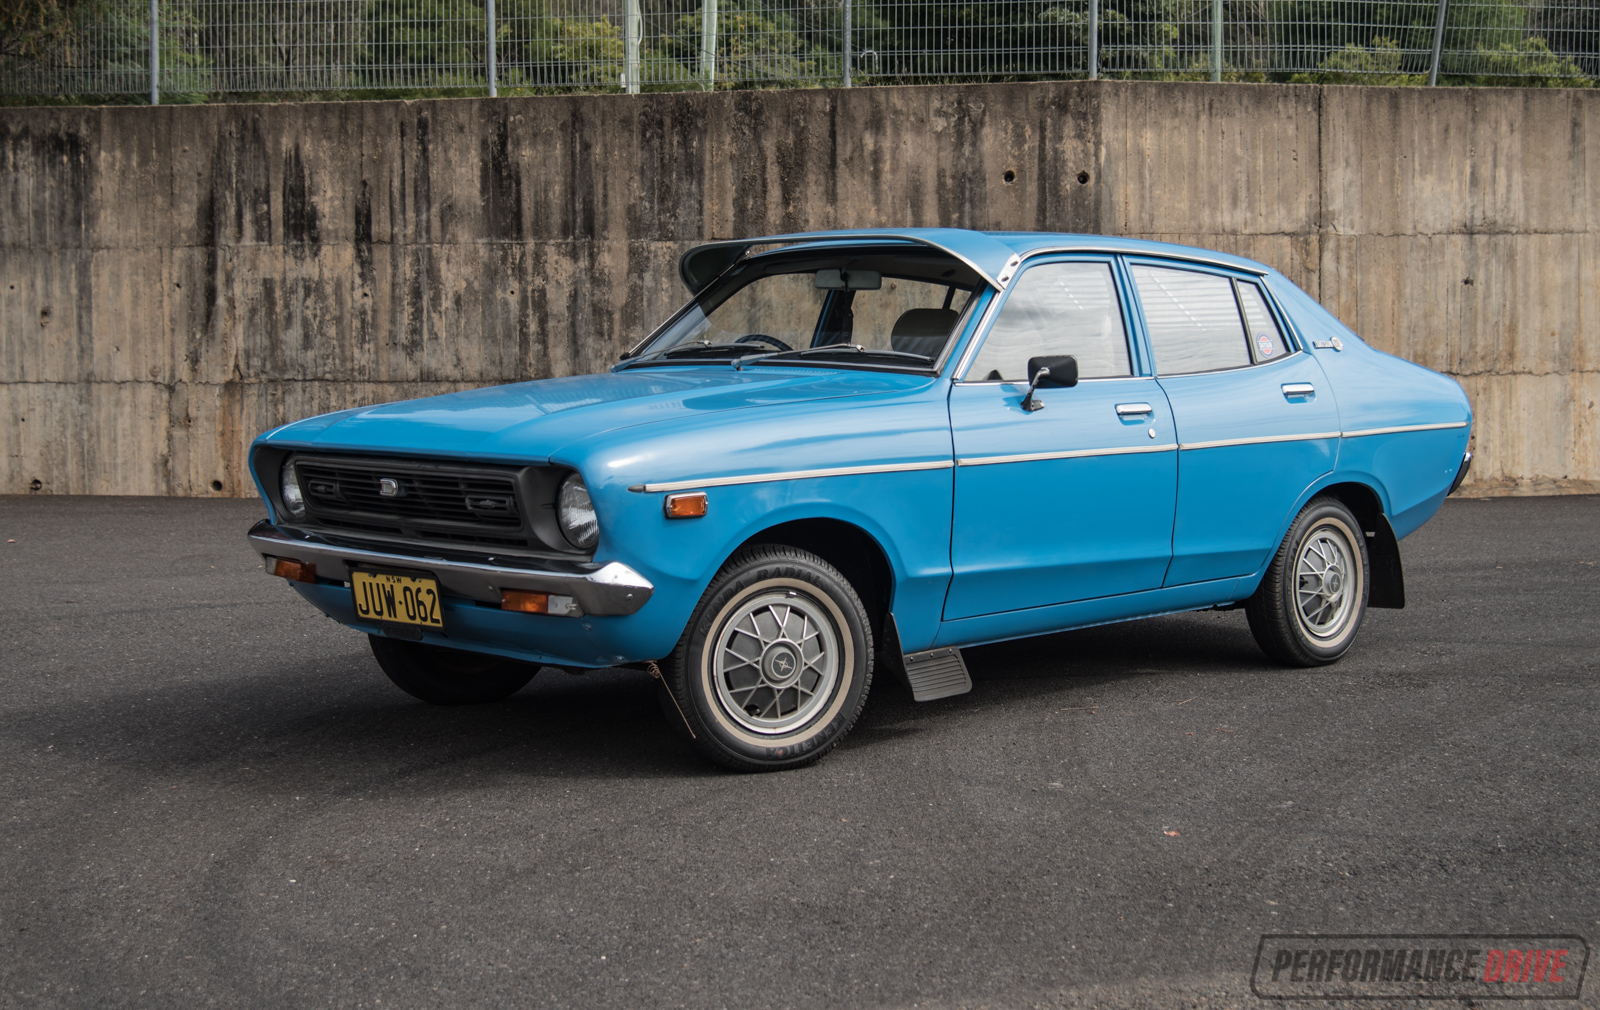 Video: 1978 Datsun 120Y 0-100km/h & engine sound ...